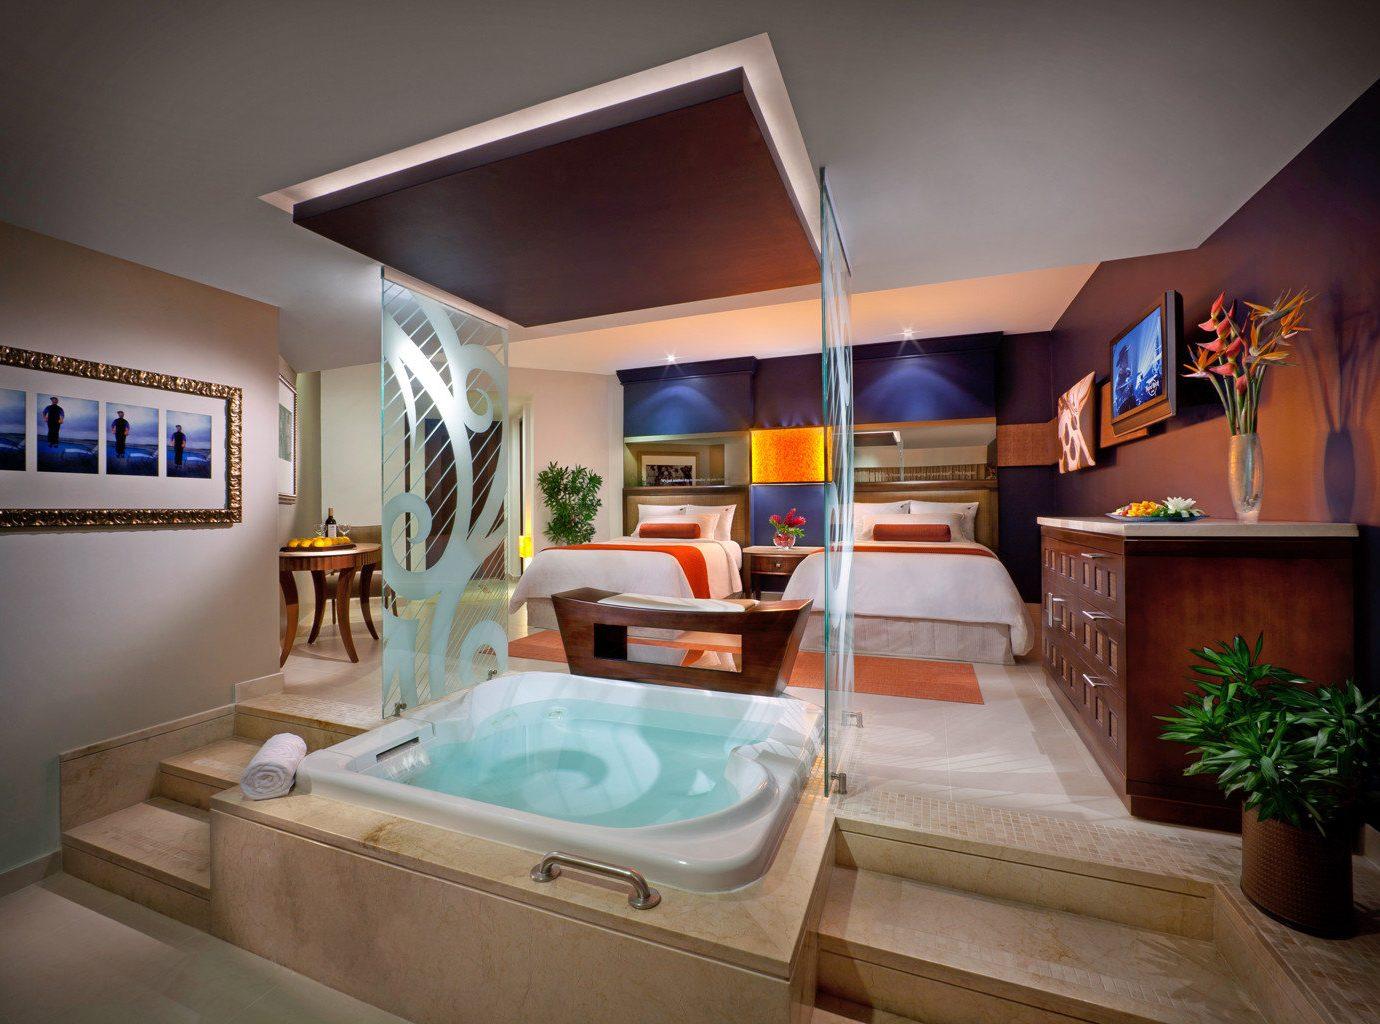 All-Inclusive Resorts Bedroom Elegant Hip Hot tub Hot tub/Jacuzzi Hotels Luxury Modern Romantic Solo Travel Suite property house home living room condominium Villa